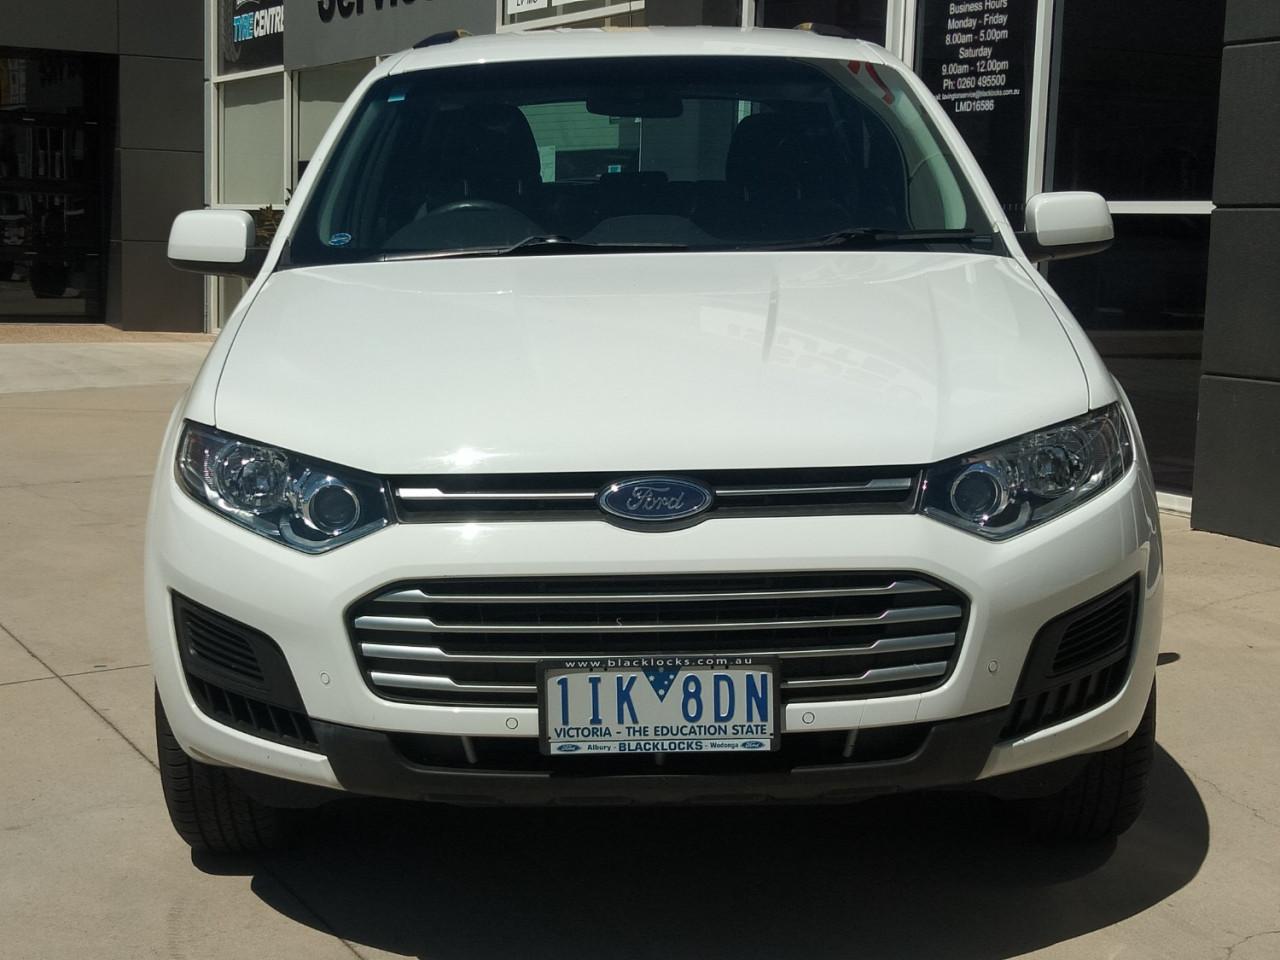 2016 Ford Territory SZ MKII TX Wagon Image 3